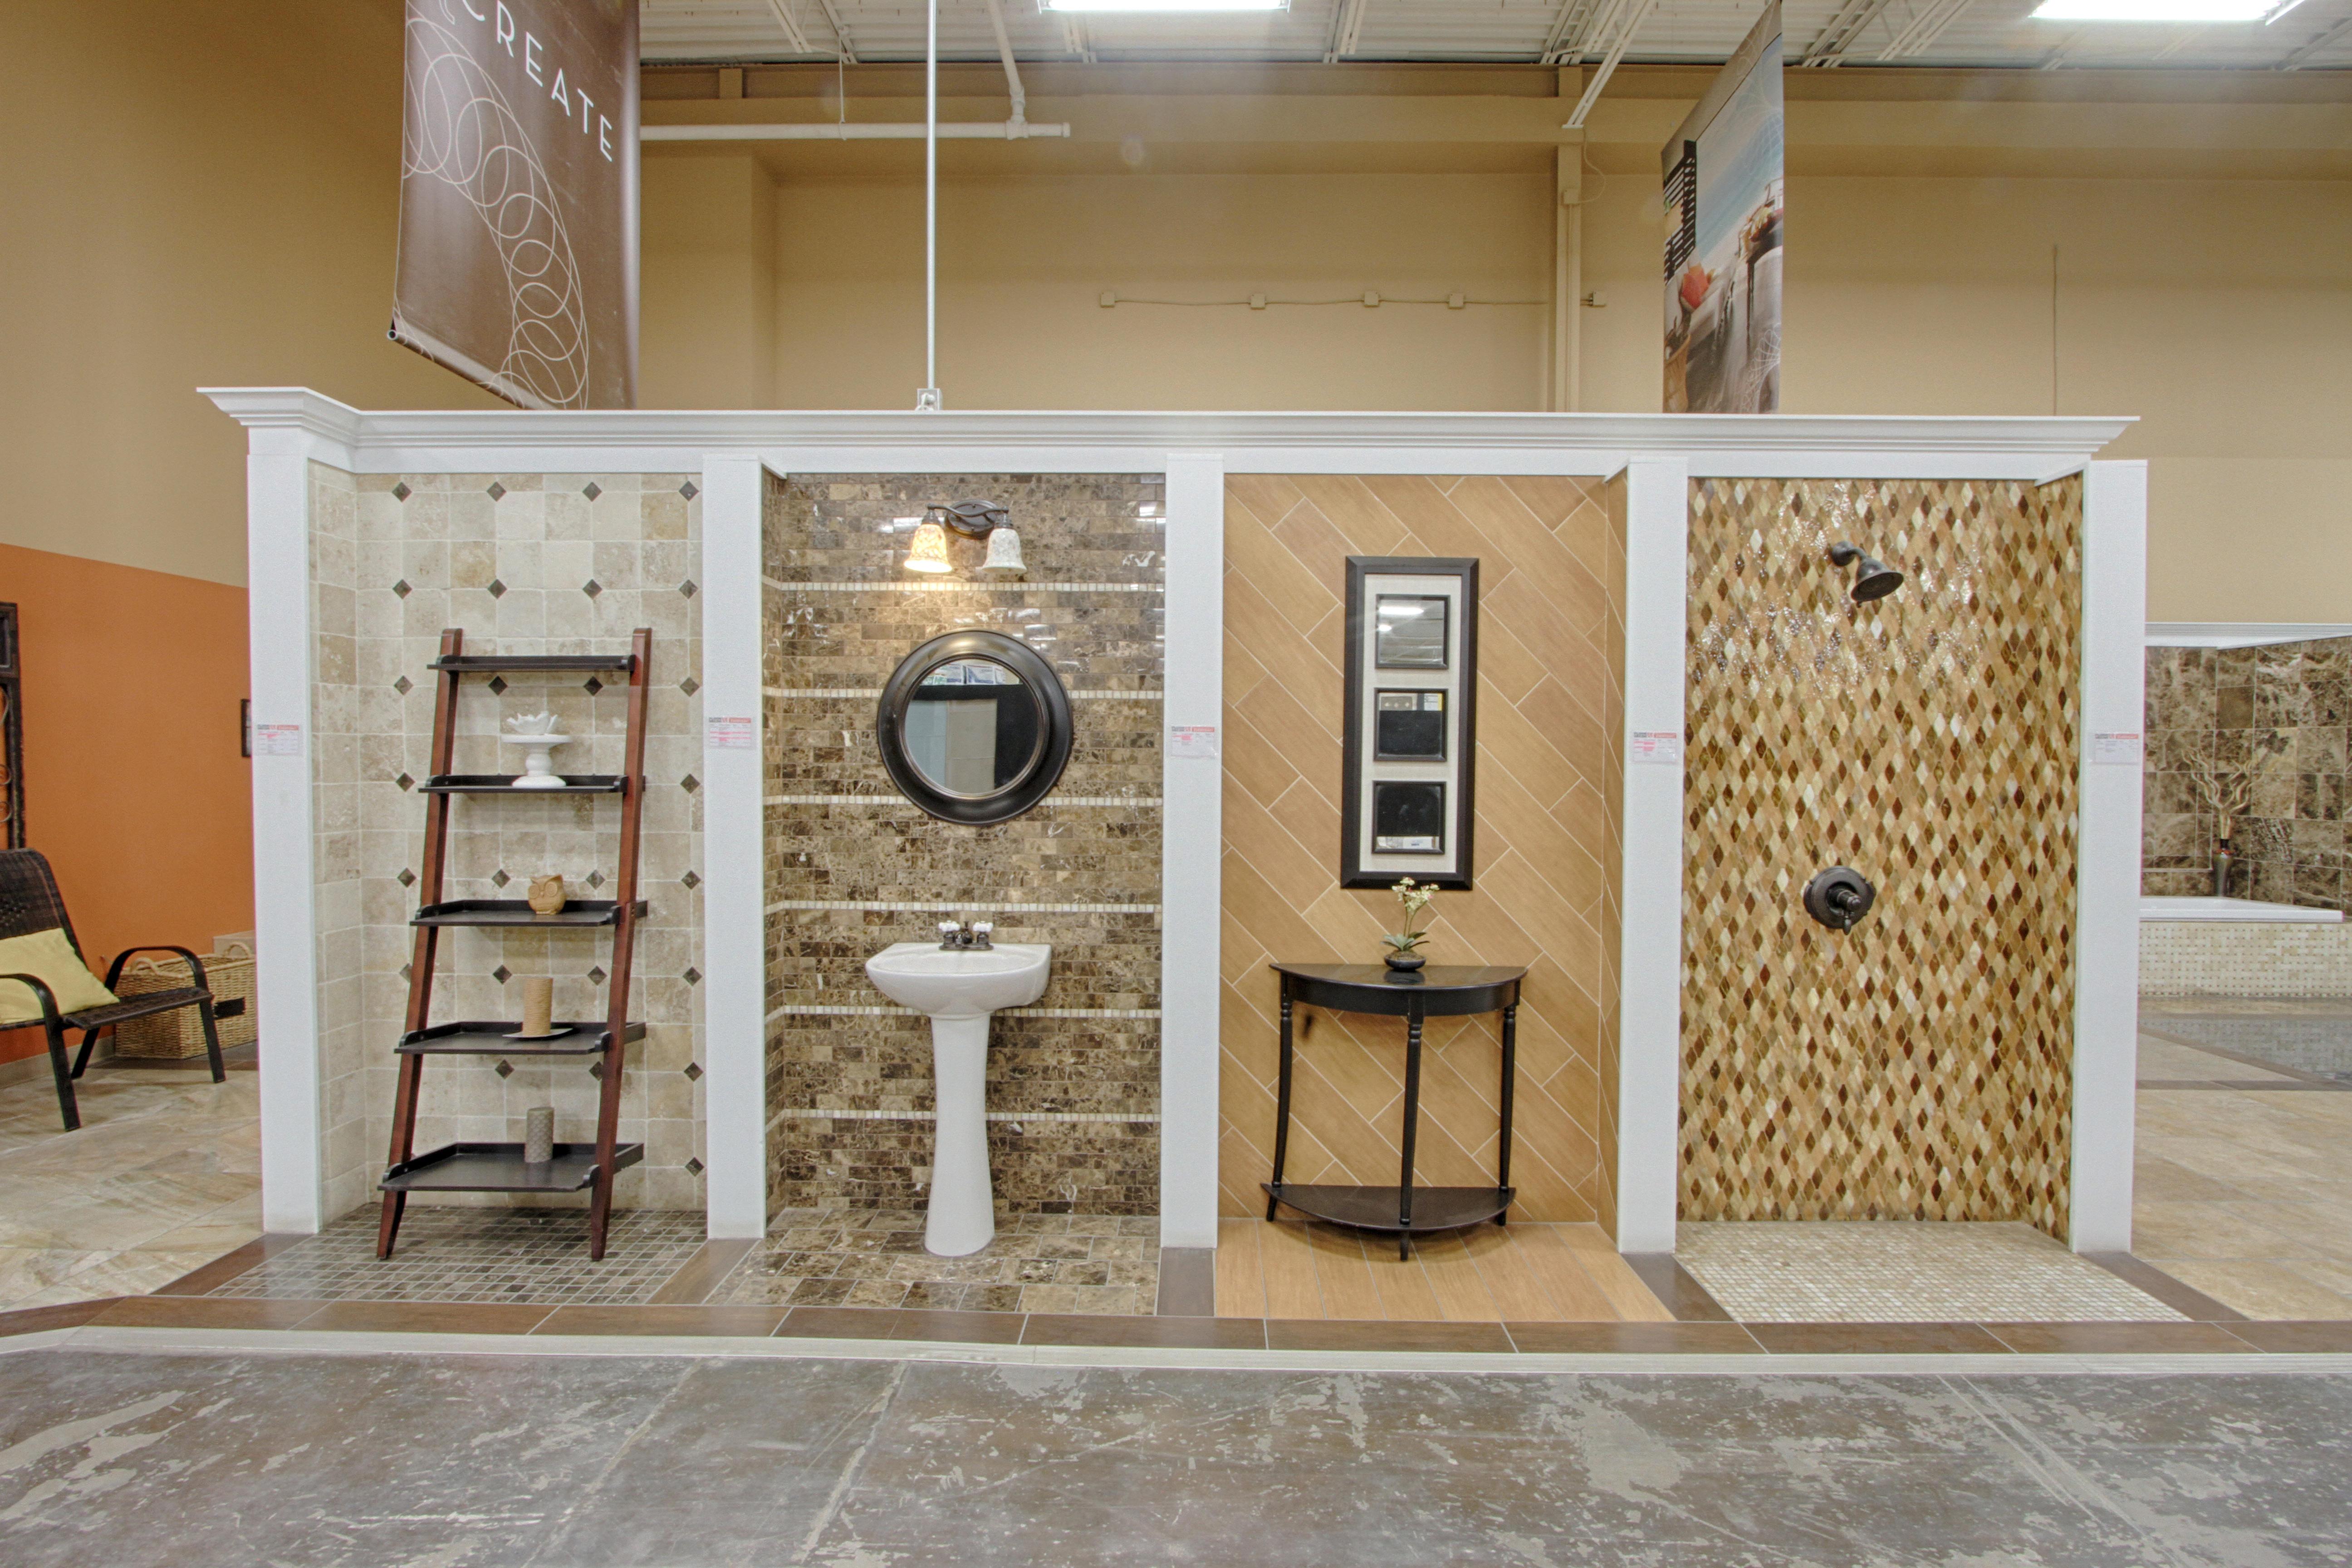 floor decor 5234 summer ave memphis tn tile ceramic contractors dealers mapquest